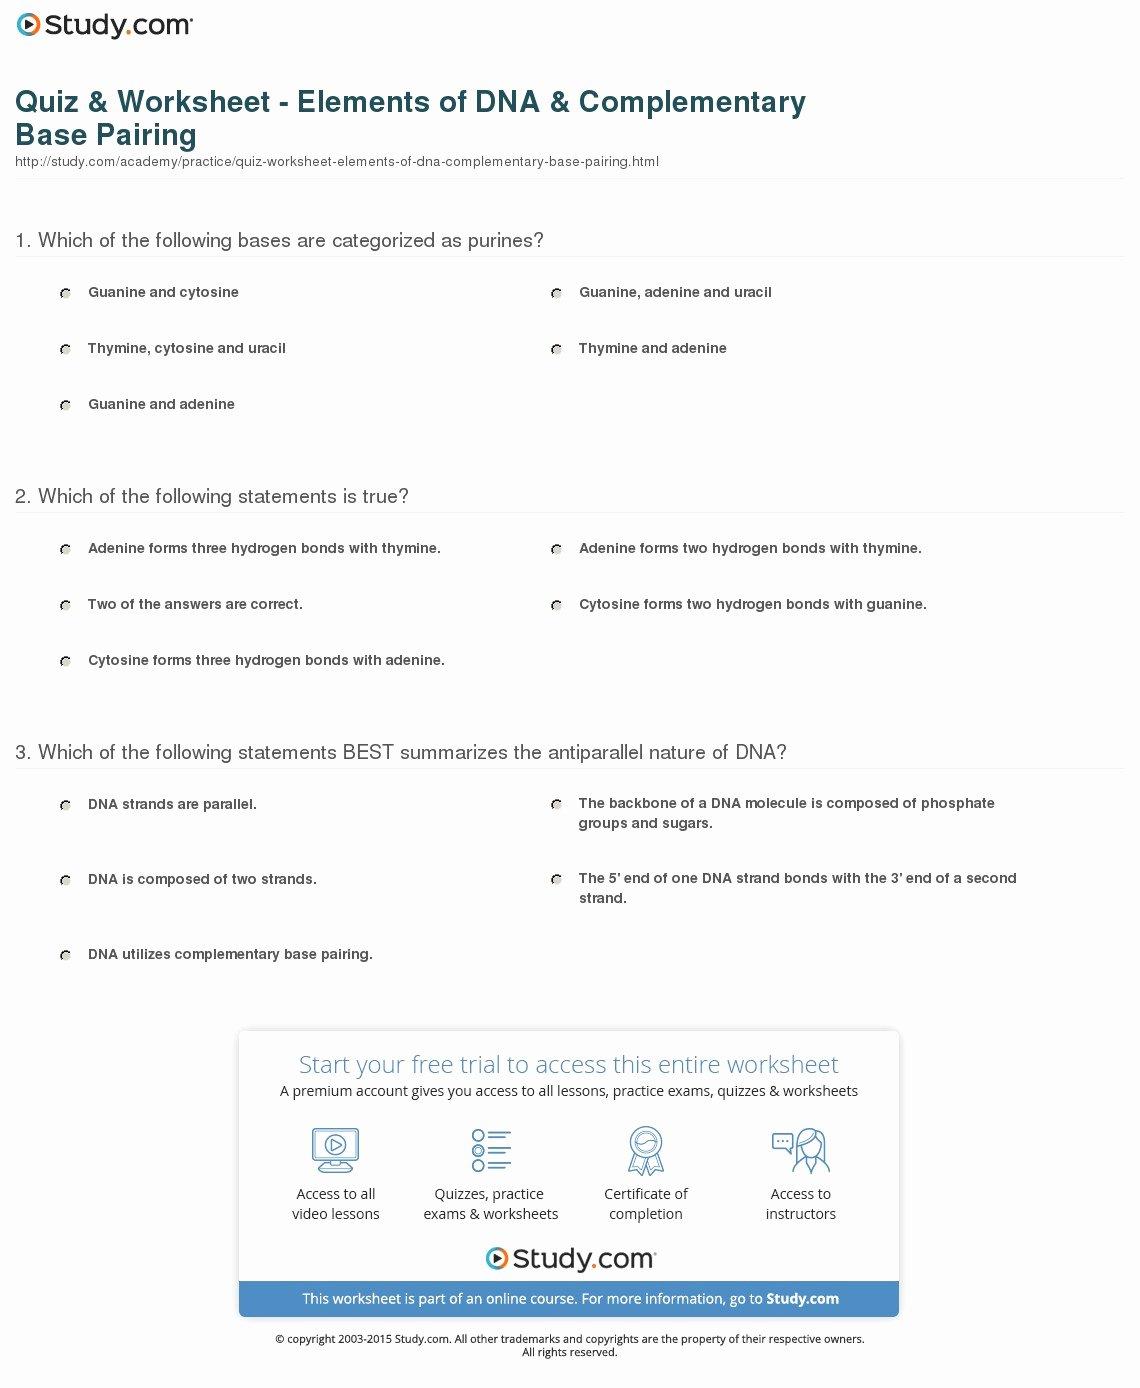 Dna Base Pairing Worksheet Answers Lovely Quiz & Worksheet Elements Of Dna & Plementary Base